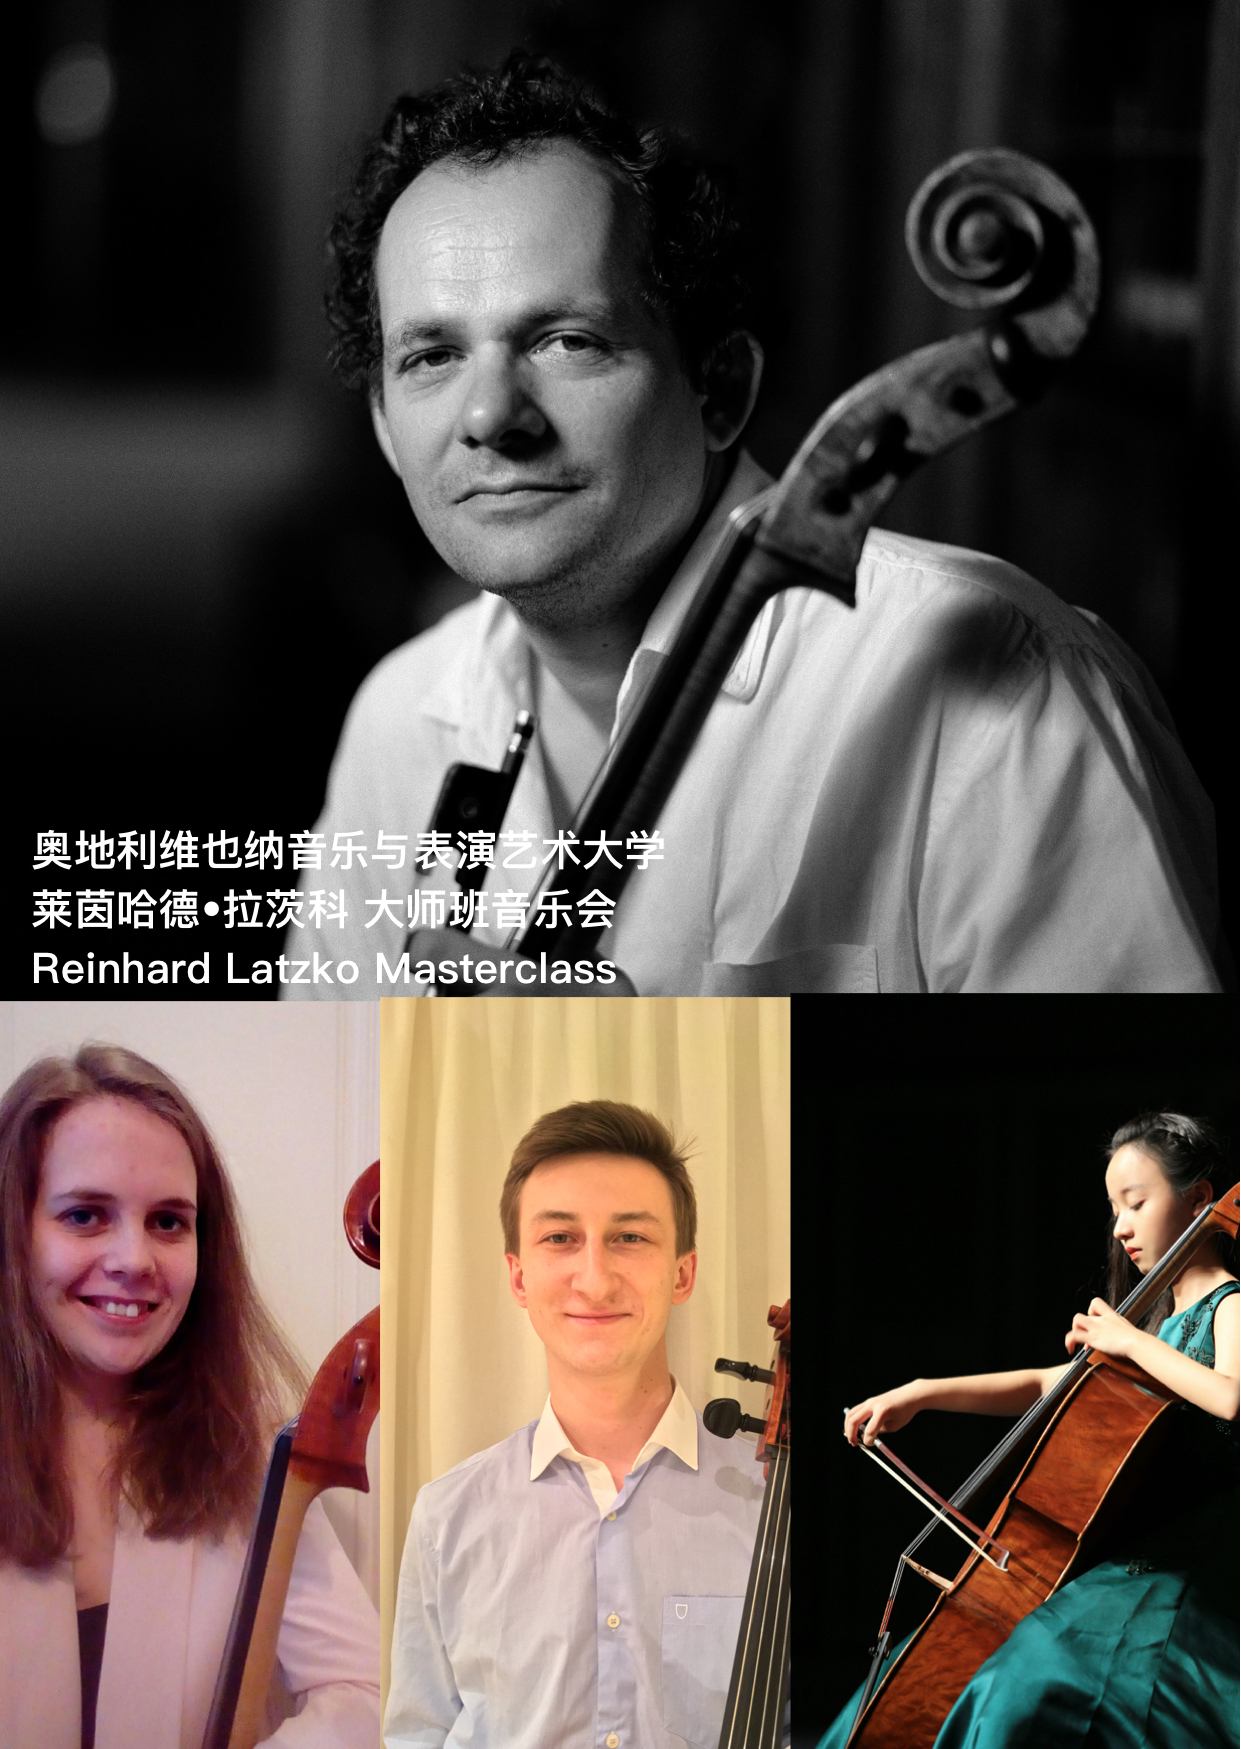 University of Music and Performing Arts Vienna Reinhard Latzko